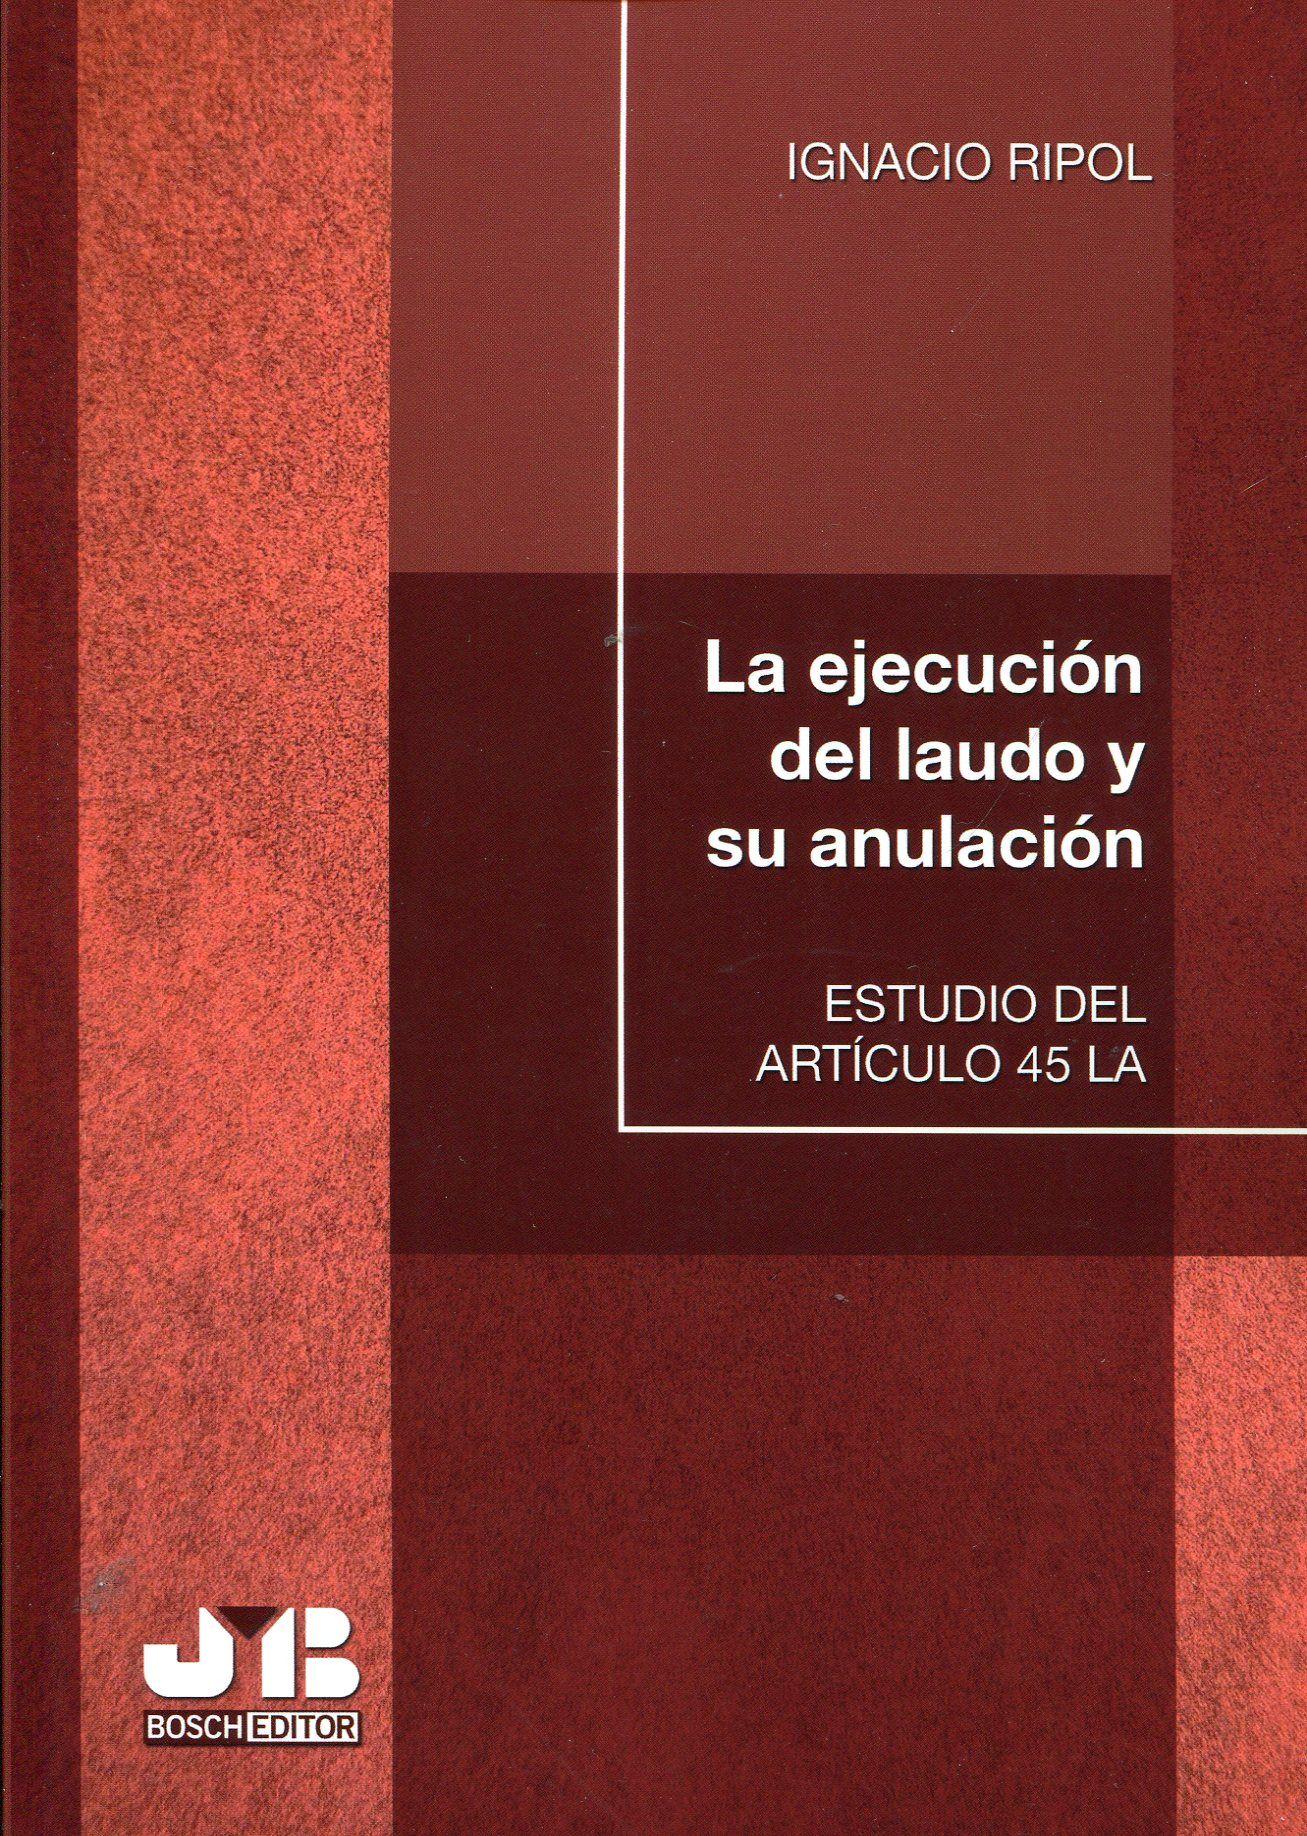 http//almena.uva.es/record=b1657213S1*spi Ejecucion